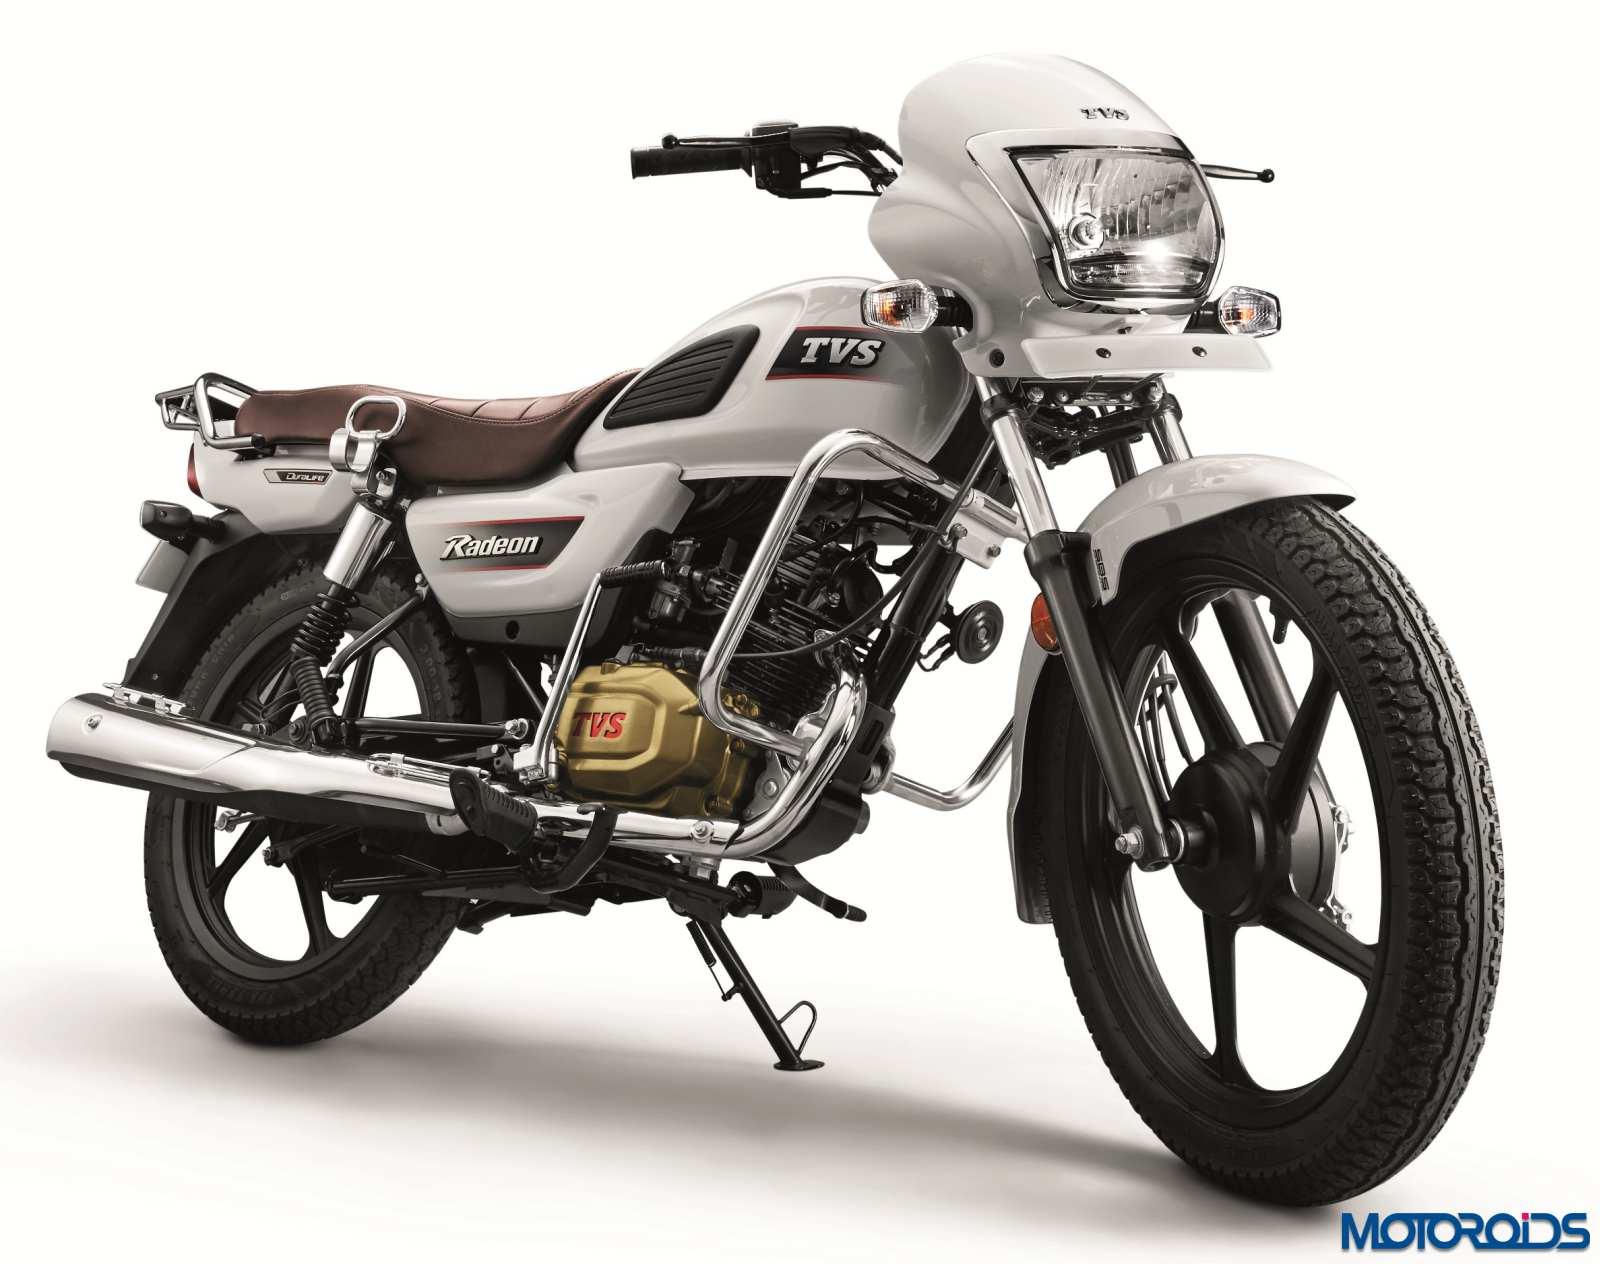 110cc Bikes You Can Buy In India - Motoroids